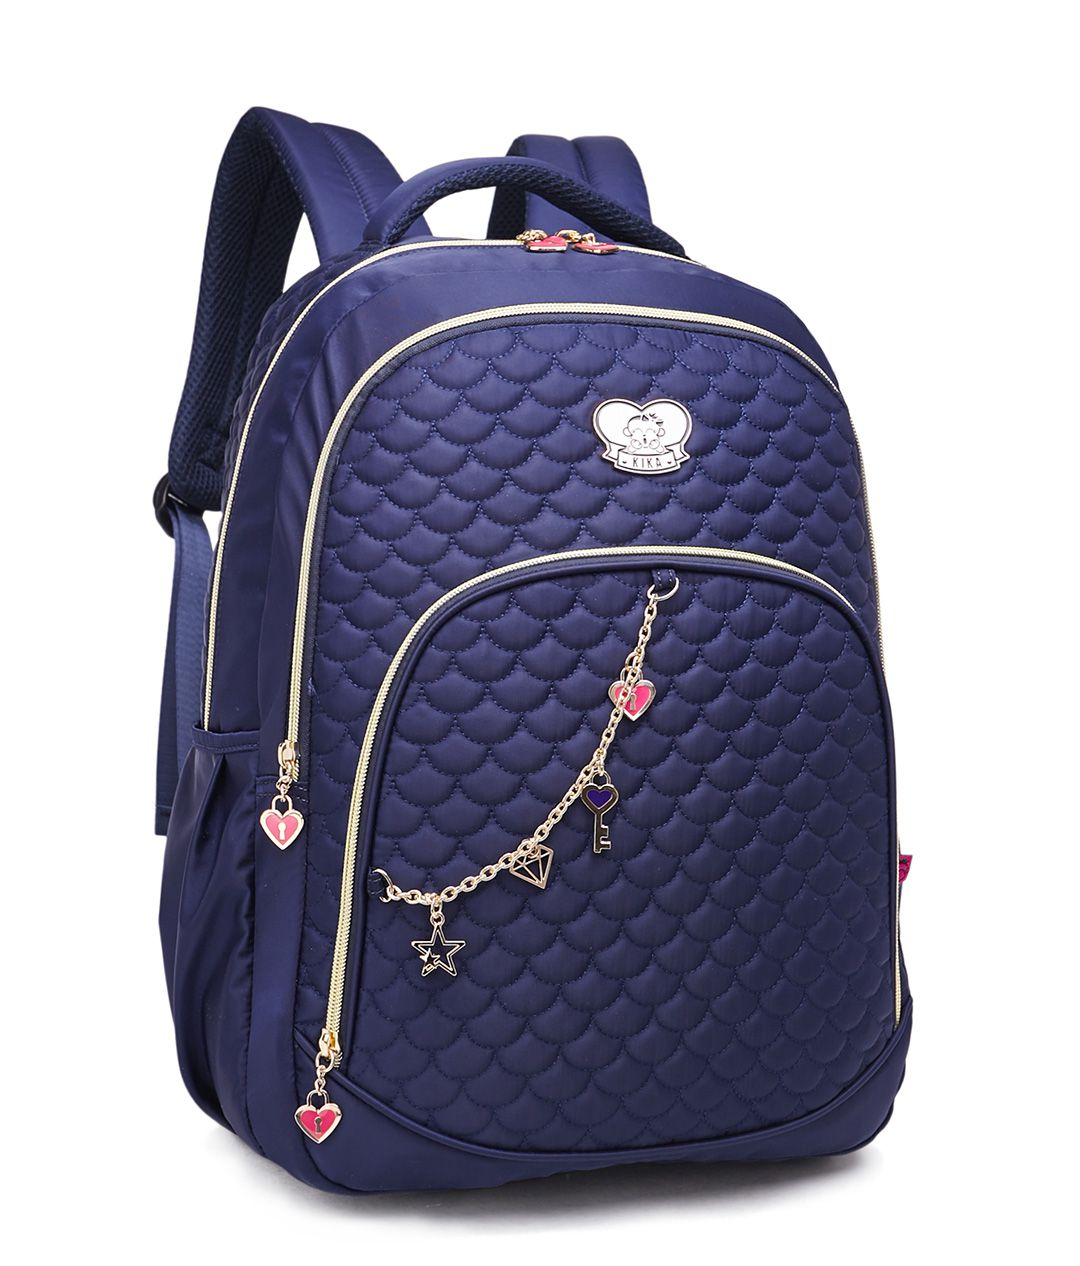 Mochila Escolar Faculdade Feminino Kika K259 Juvenil Azul